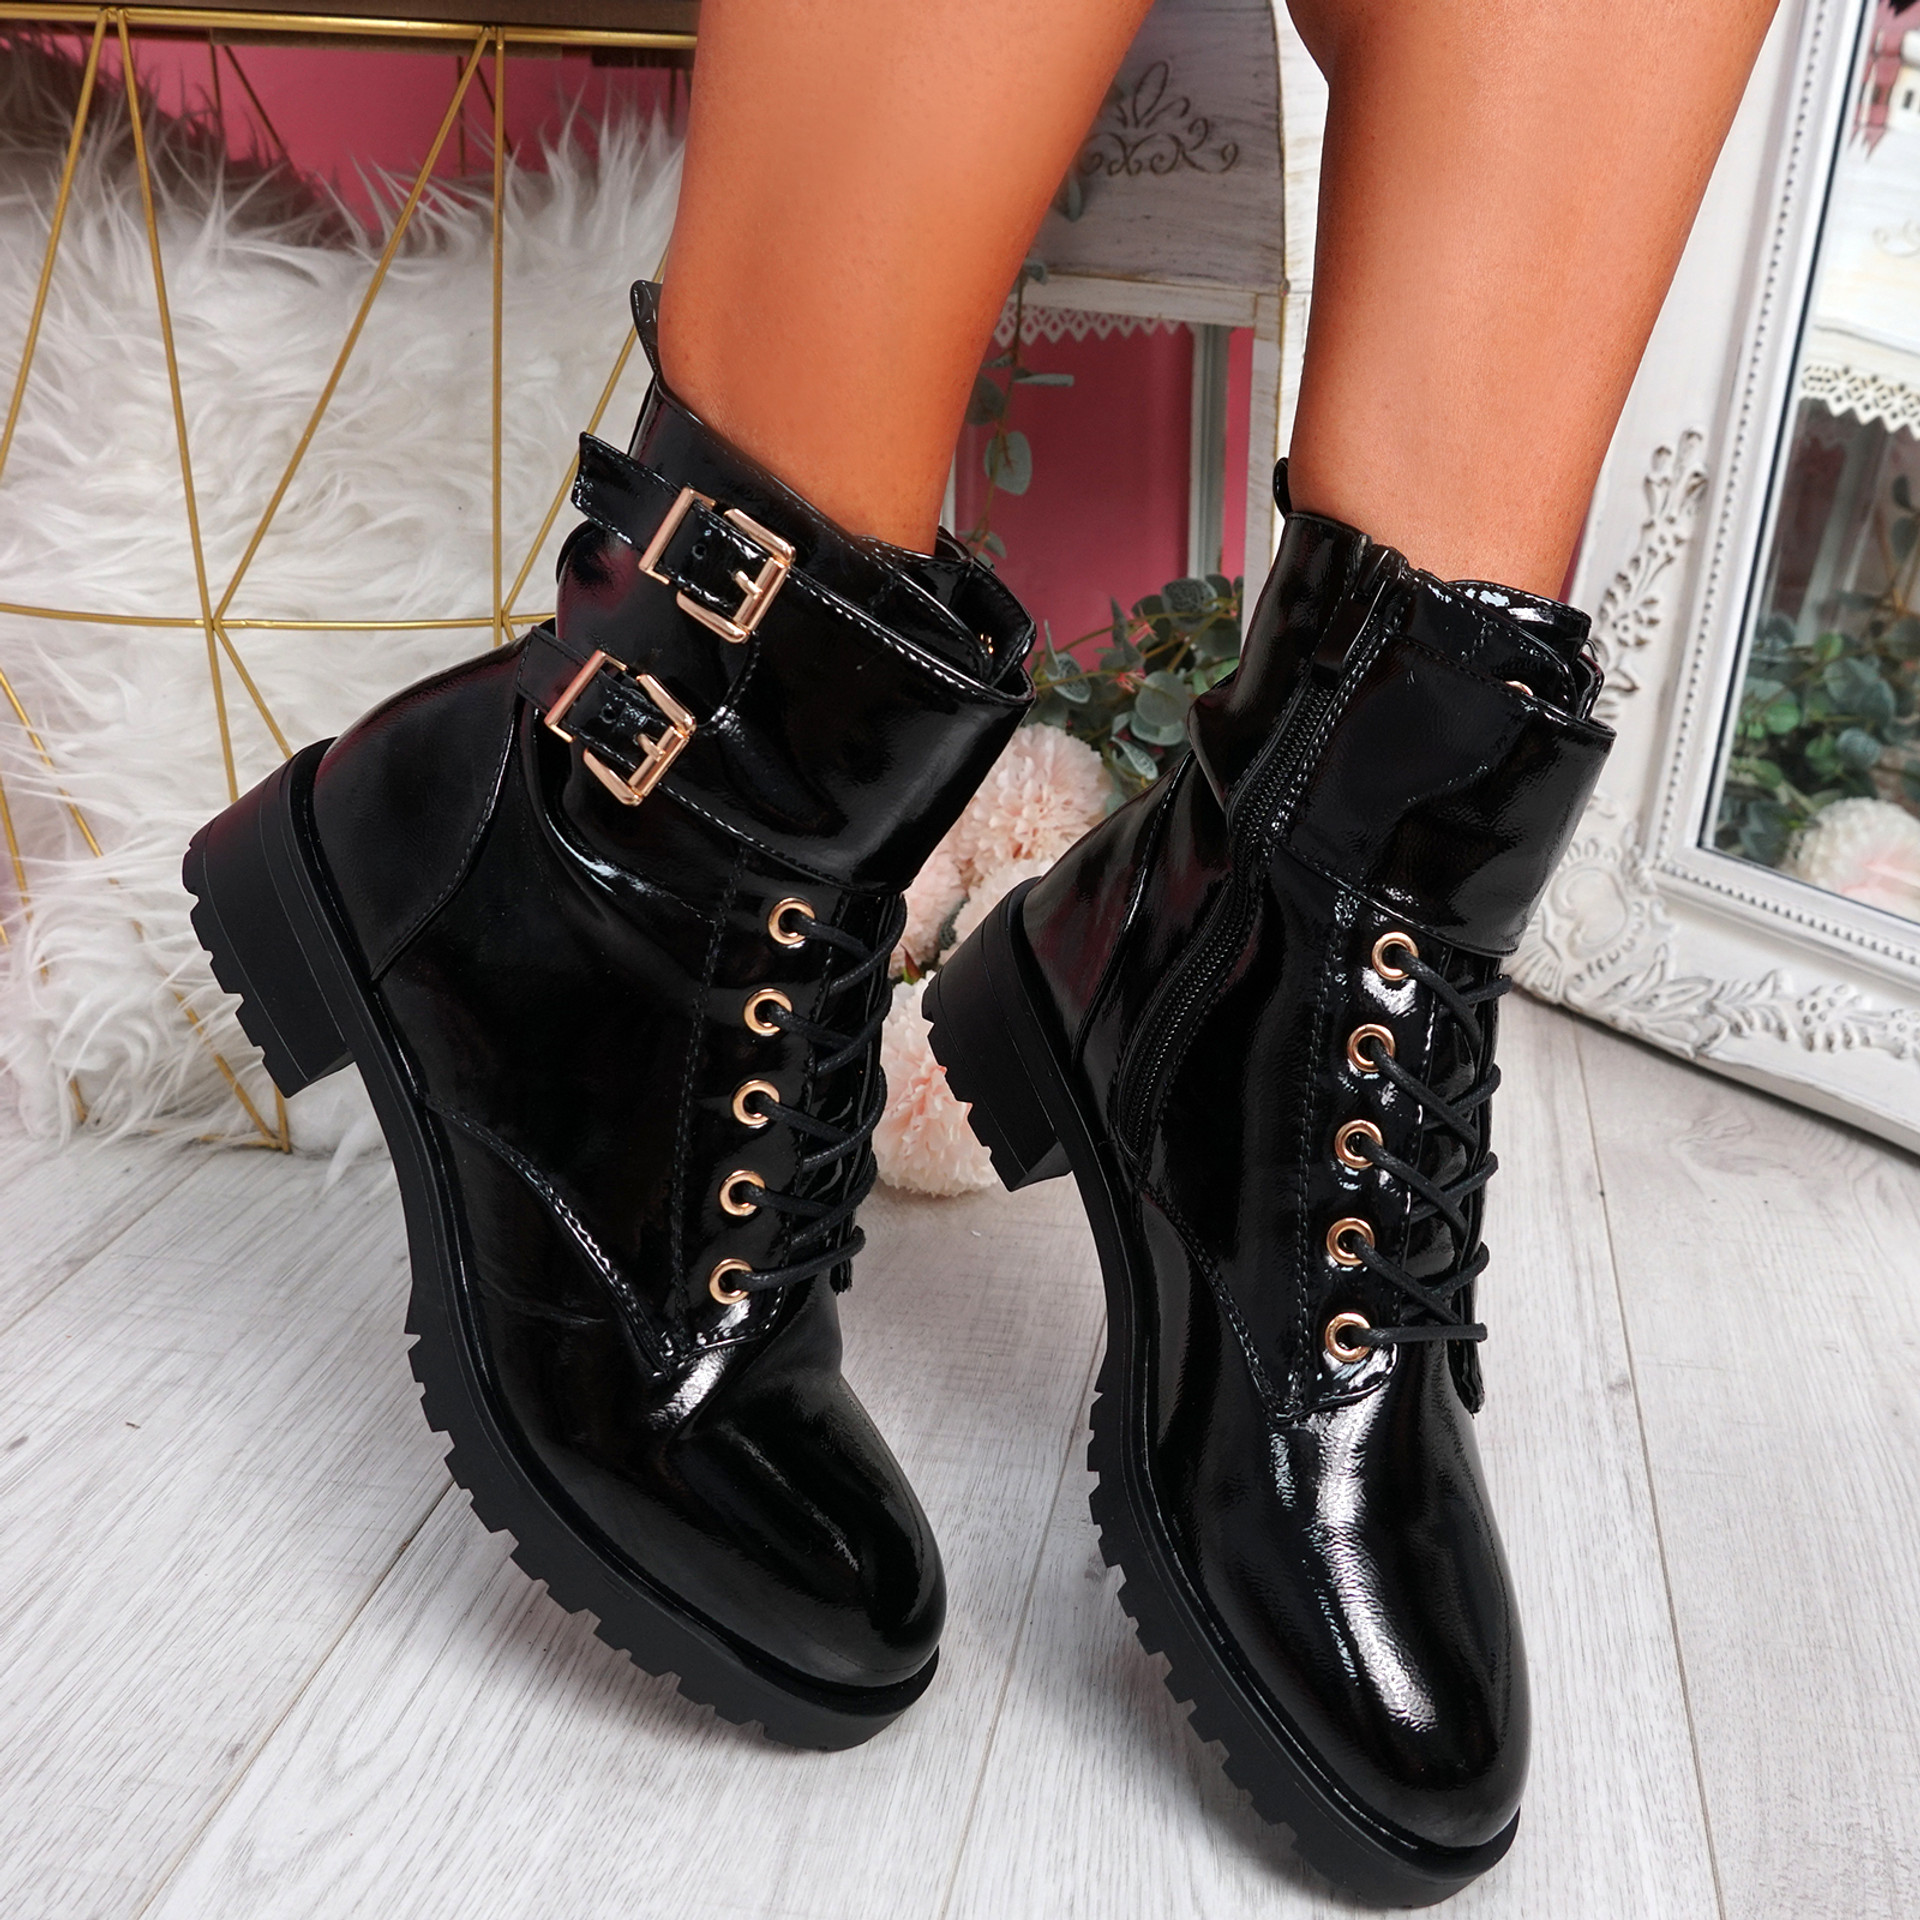 Korra Black Patent Zip Ankle Boots